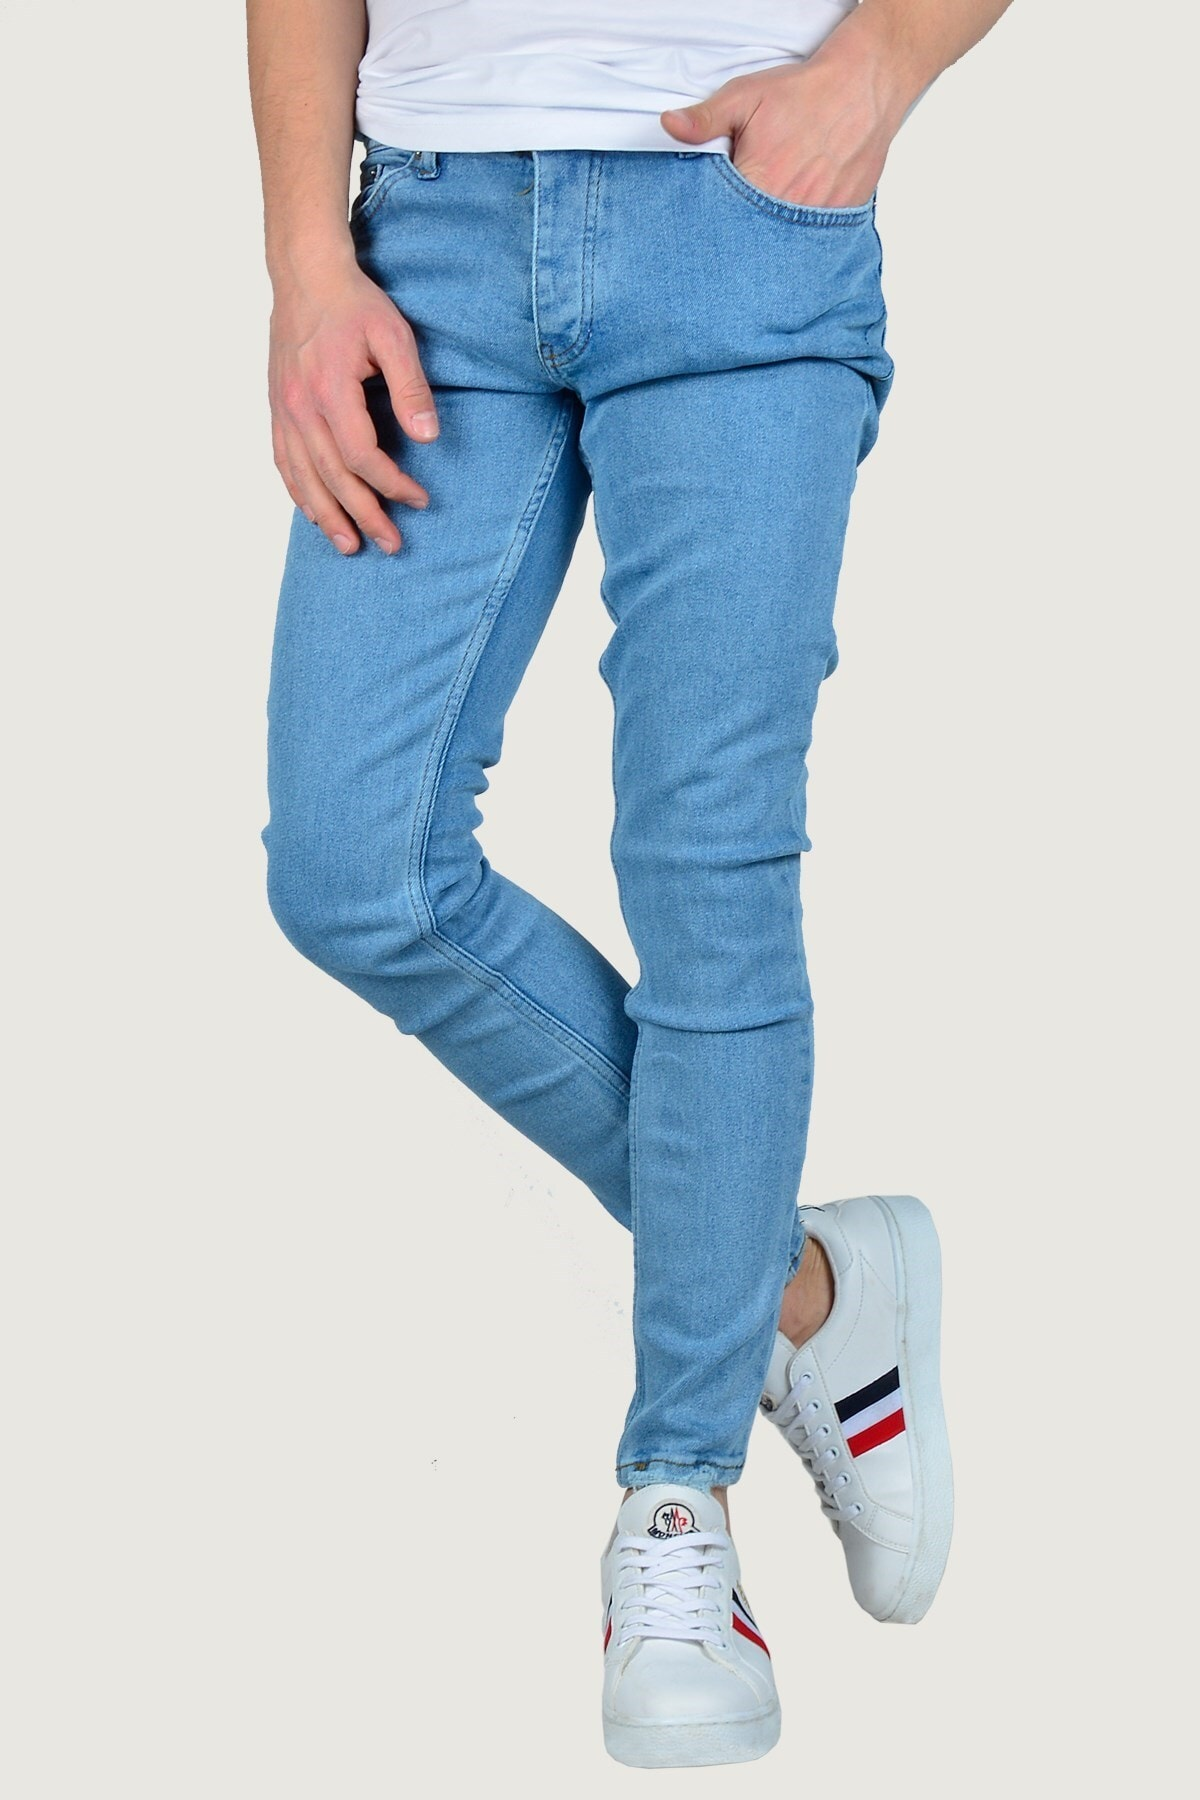 Terapi Men Erkek Kot Pantolon 9K-2100320-011 Buz Mavisi